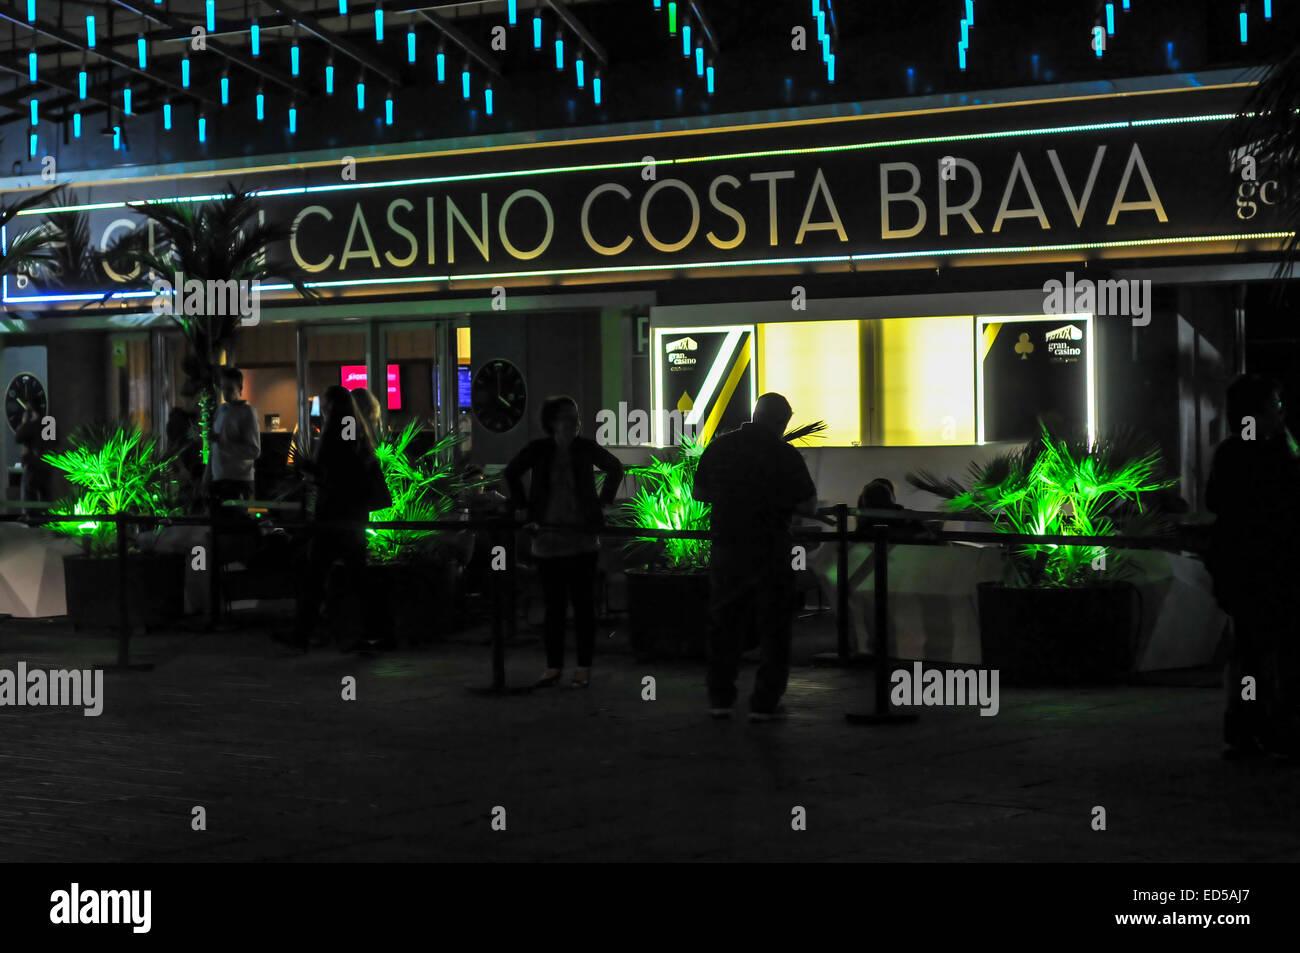 Casino-Eingang bei Nacht, mutig Costa, Spanien Stockbild